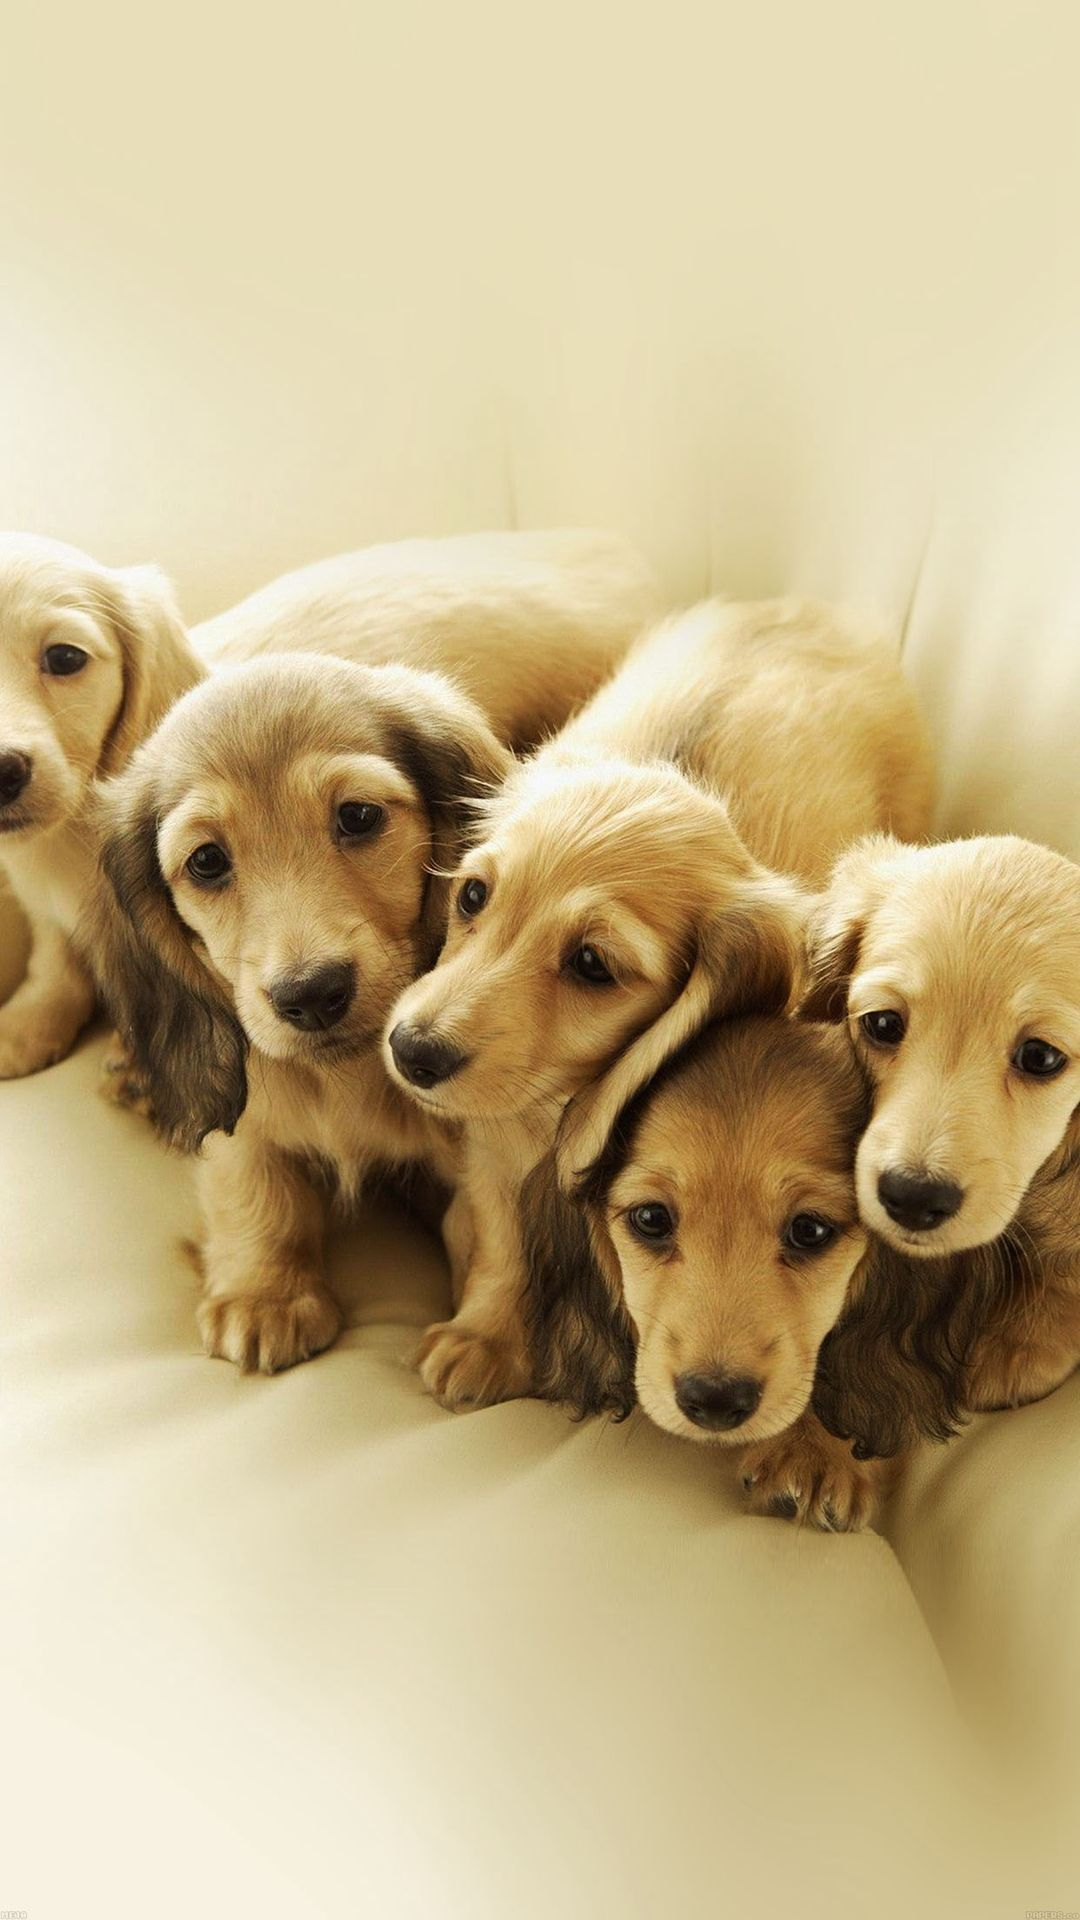 Puppy Retriever Family Animal Iphone 8 Wallpaper Dog